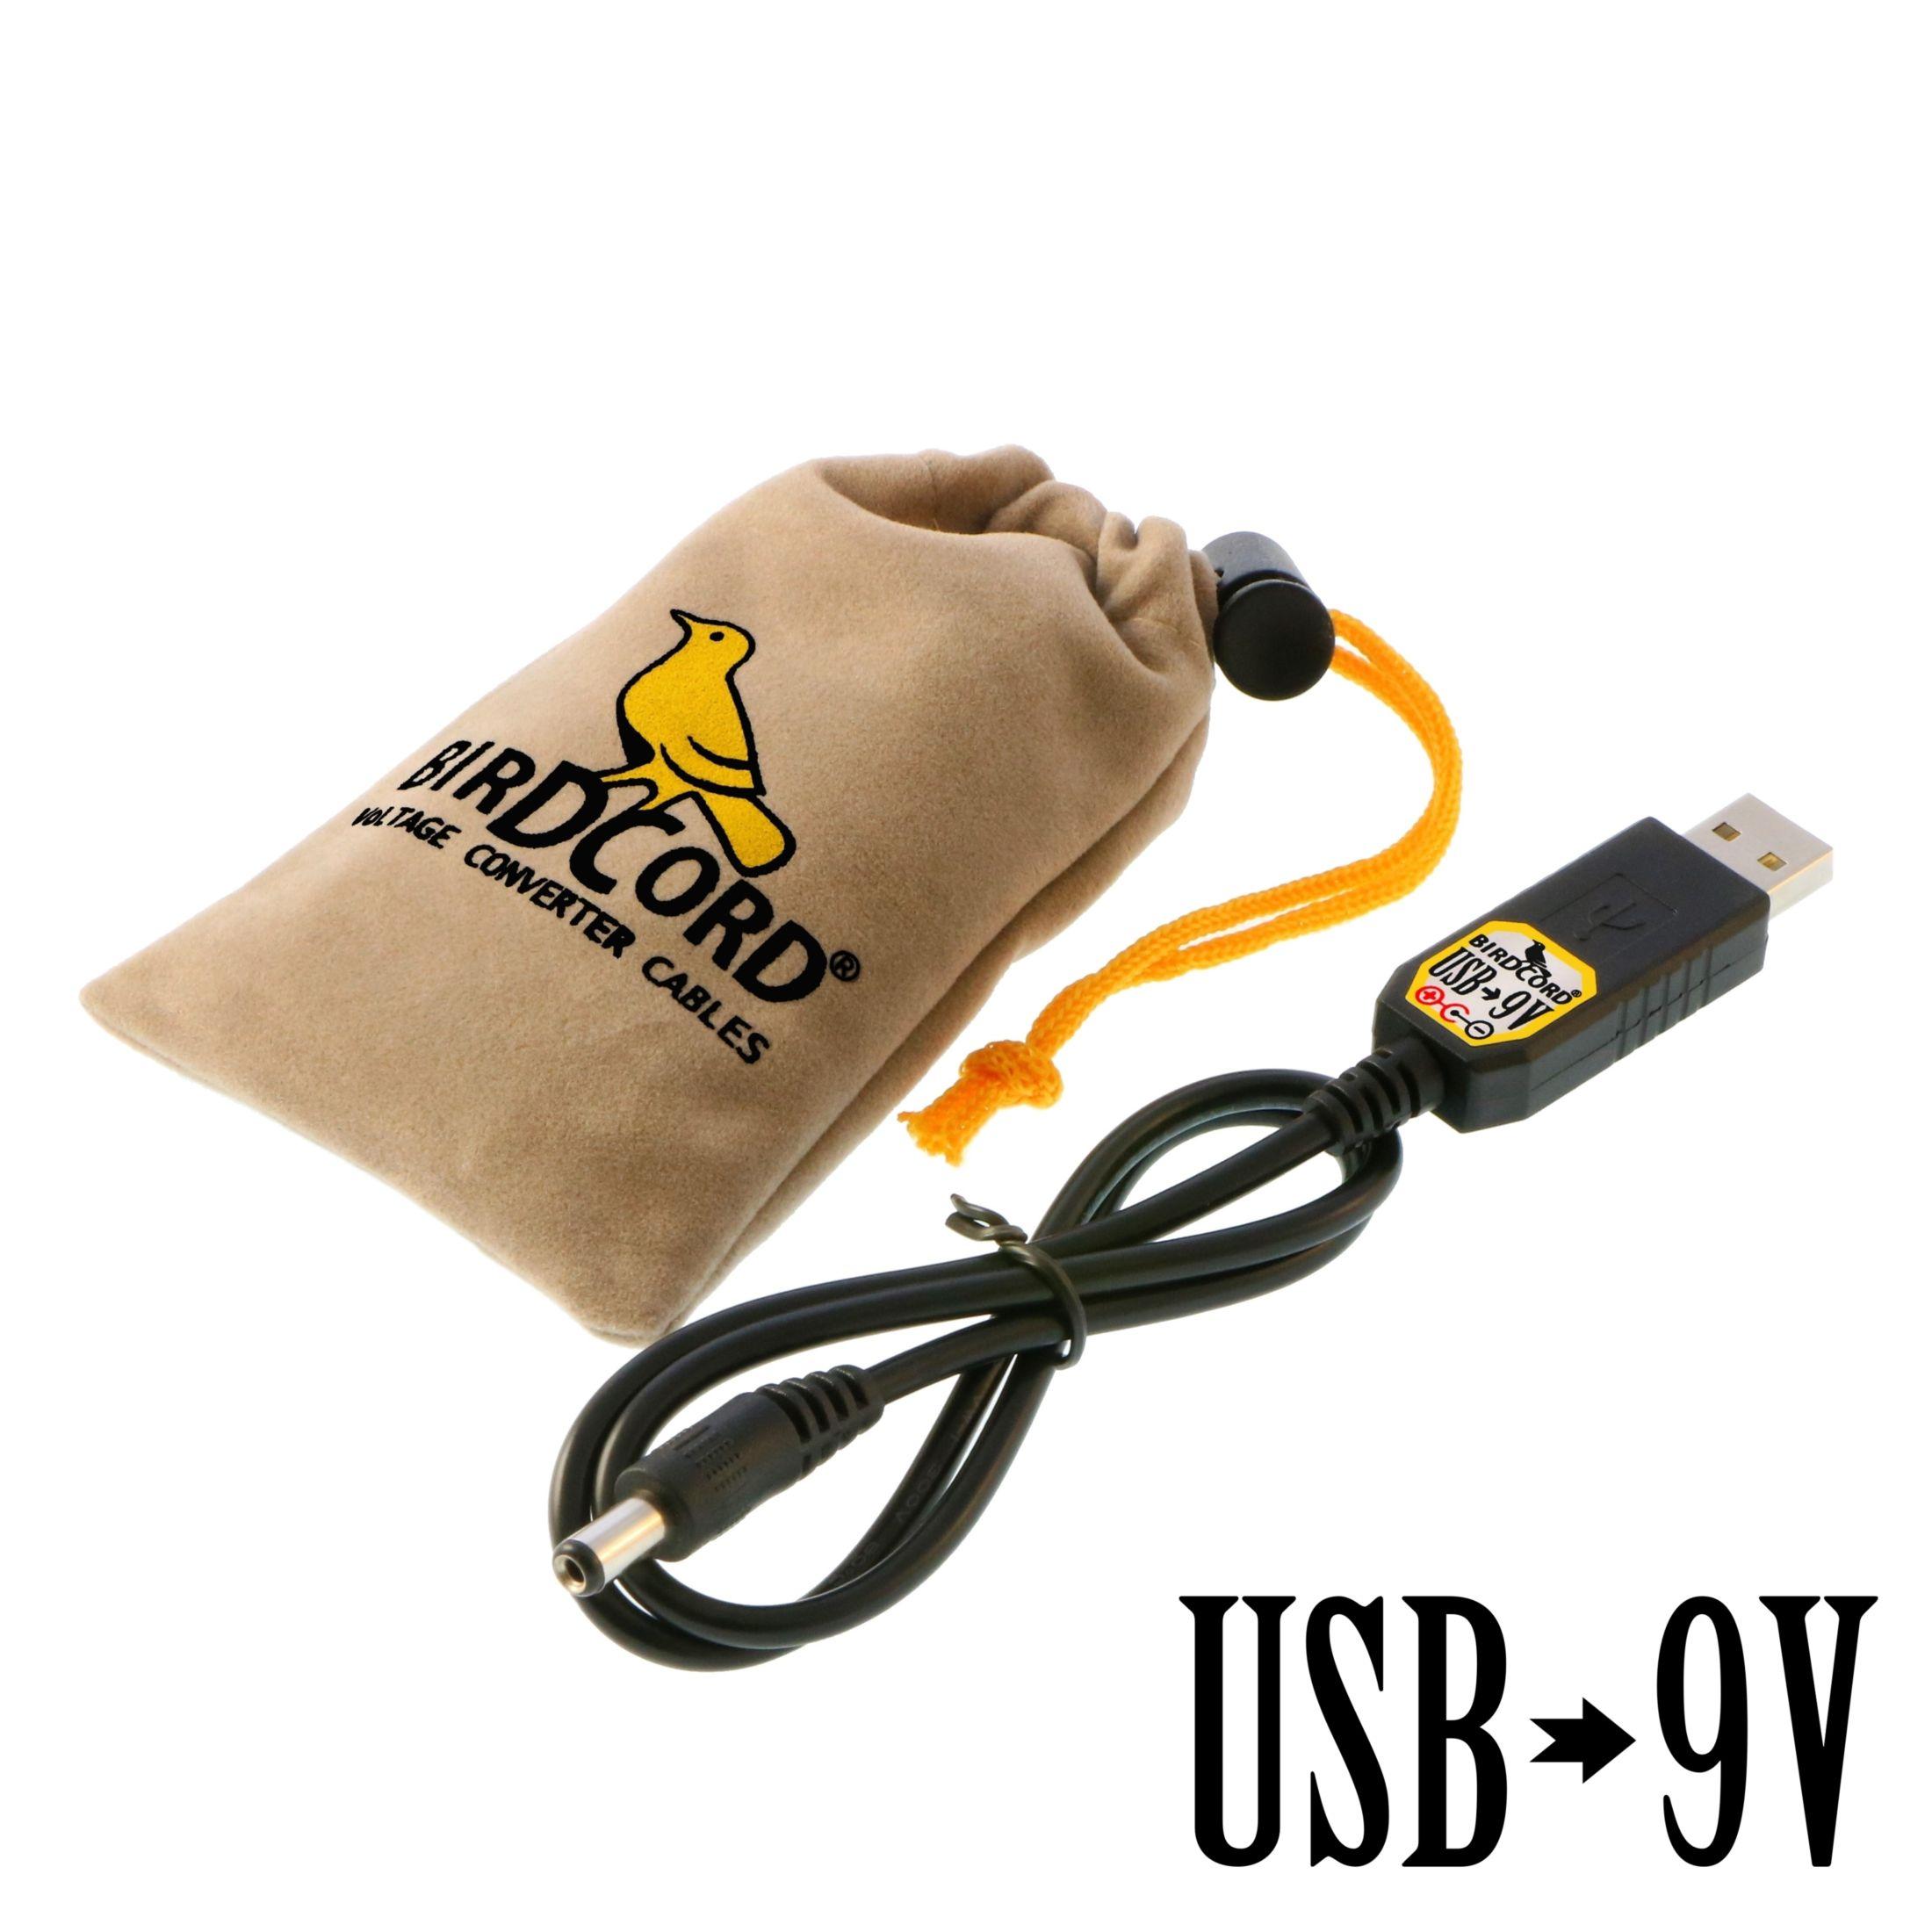 Birdcord USB to 9V Converter Cable